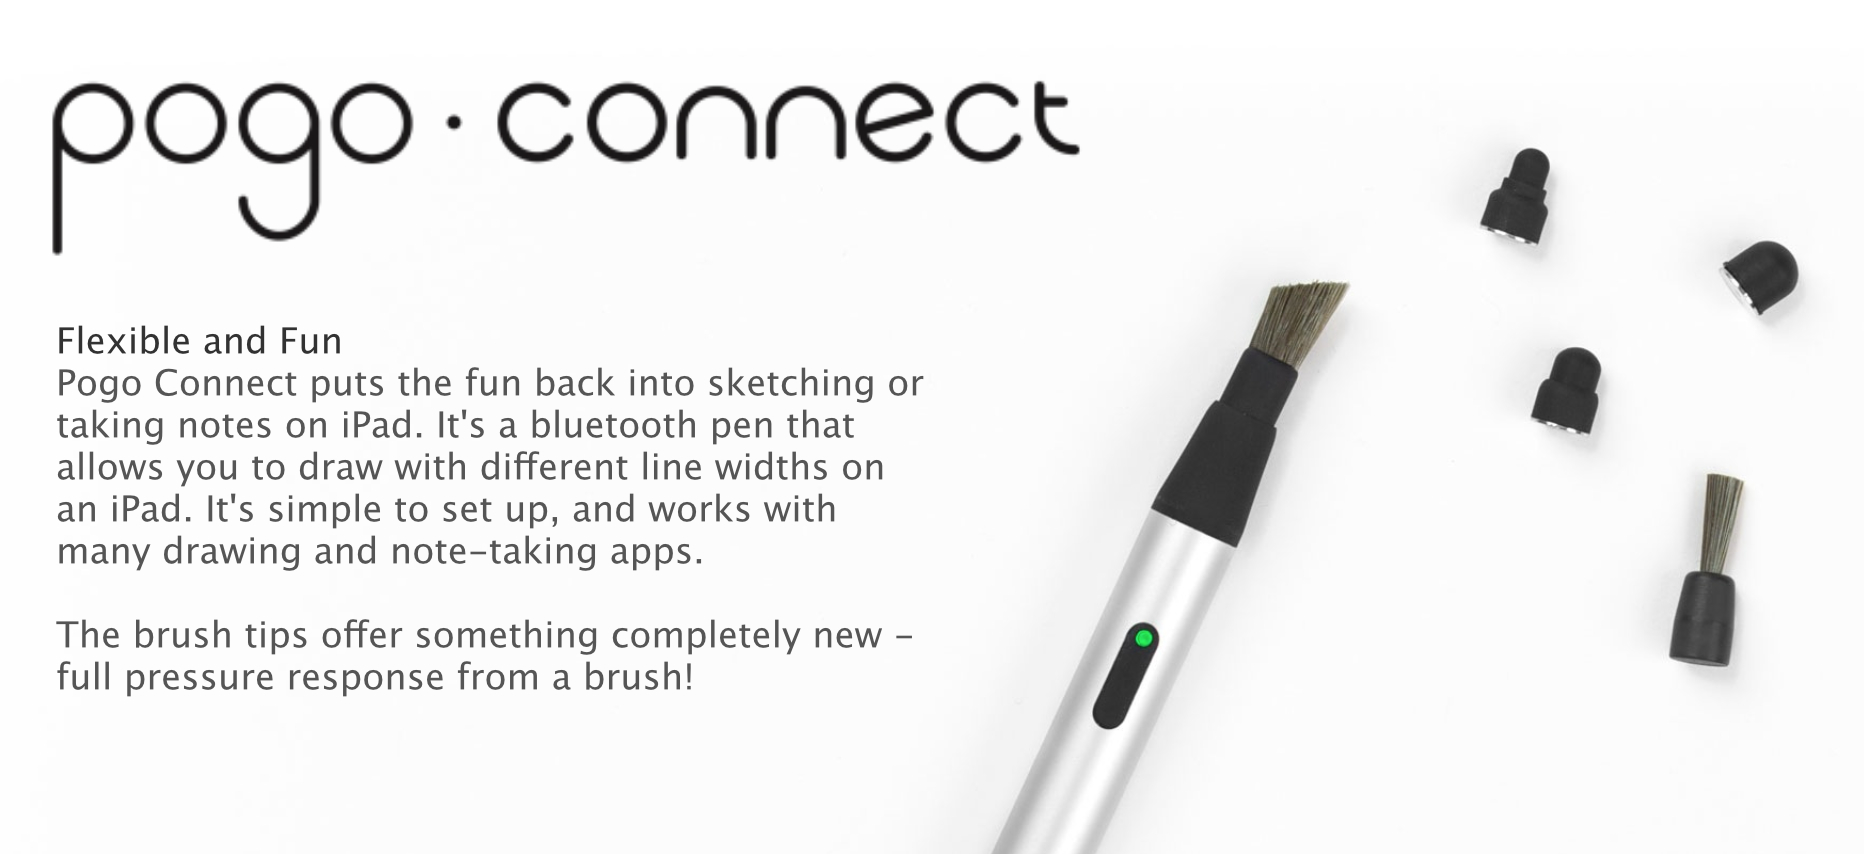 pogoconnect0009.jpg